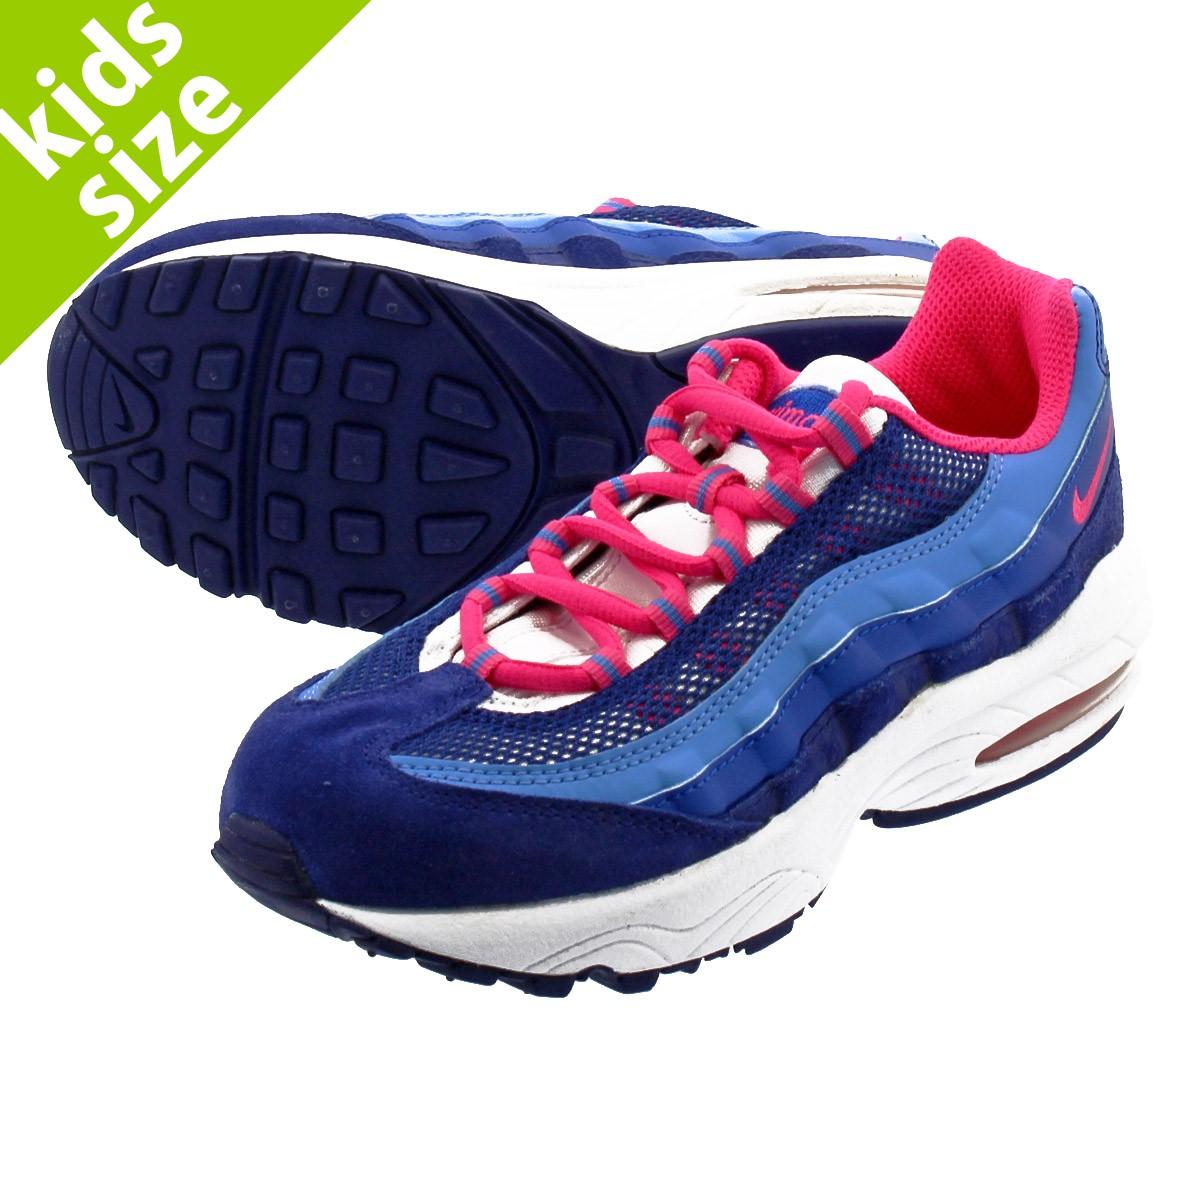 hot sale online 652d1 53659 NIKE AIR MAX 95 PS Kie Ney AMAX SE PS DEEP ROYAL BLUE/HYPER  PINK/UNIVERSITYBLUE 310,831-401